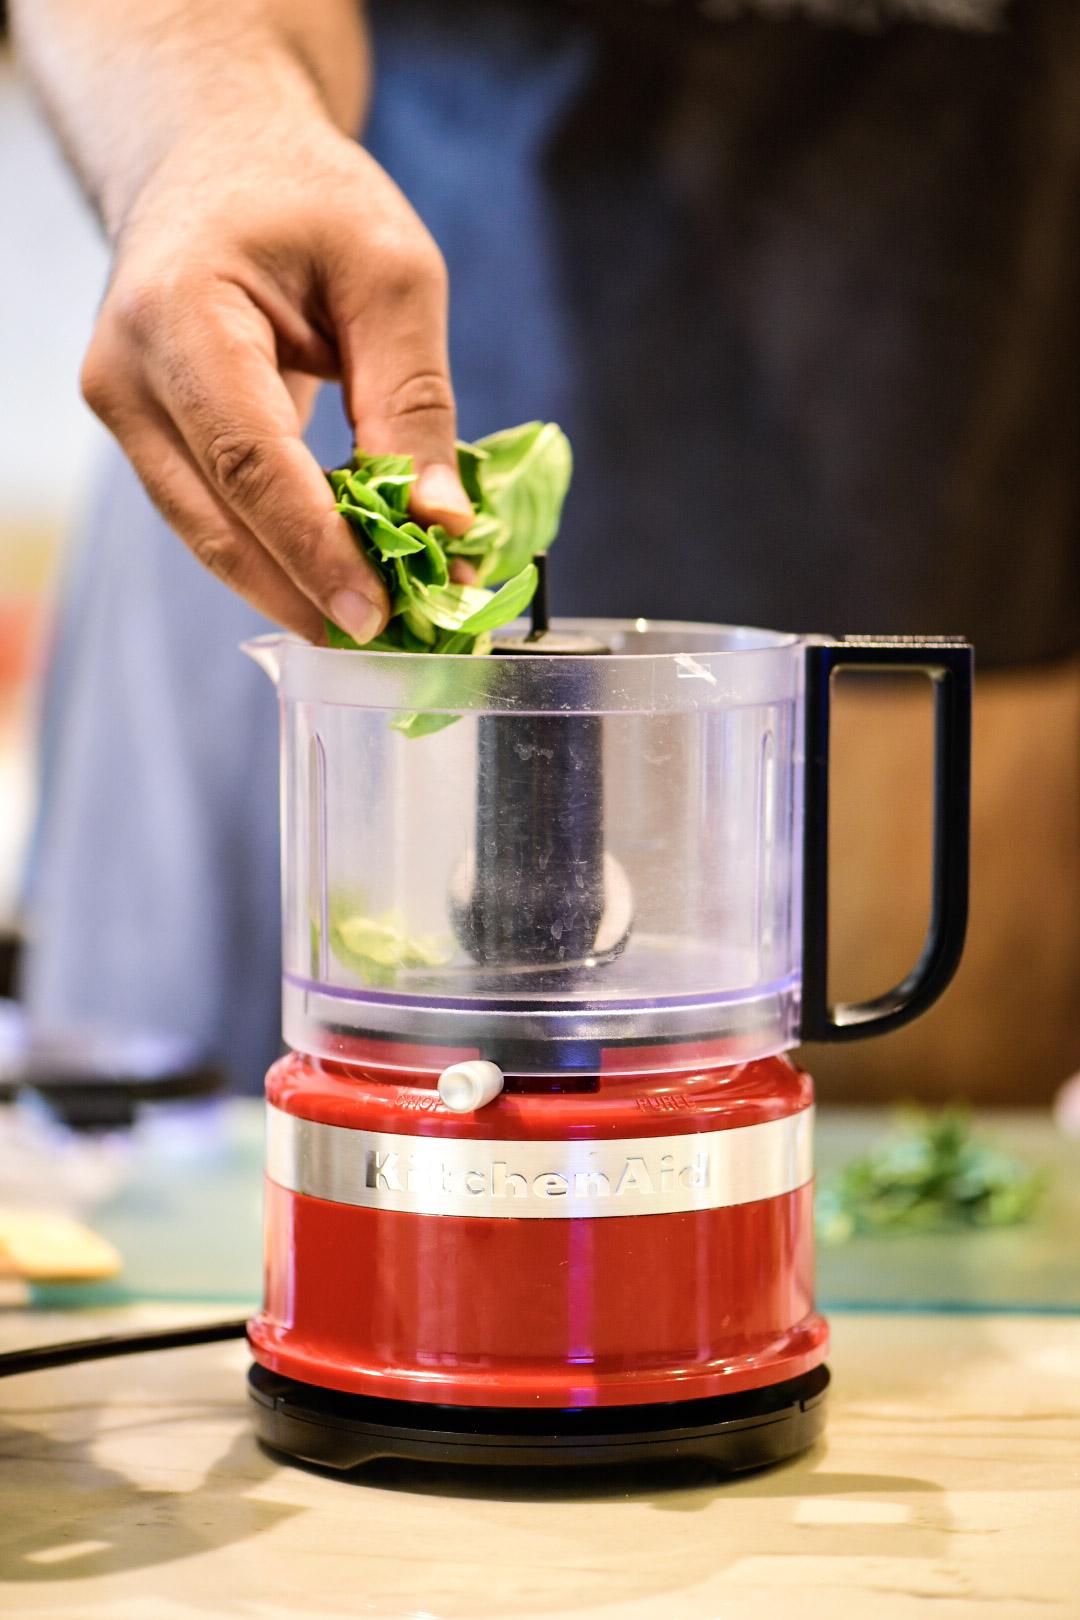 Chopping herbs for beef ragu recipe